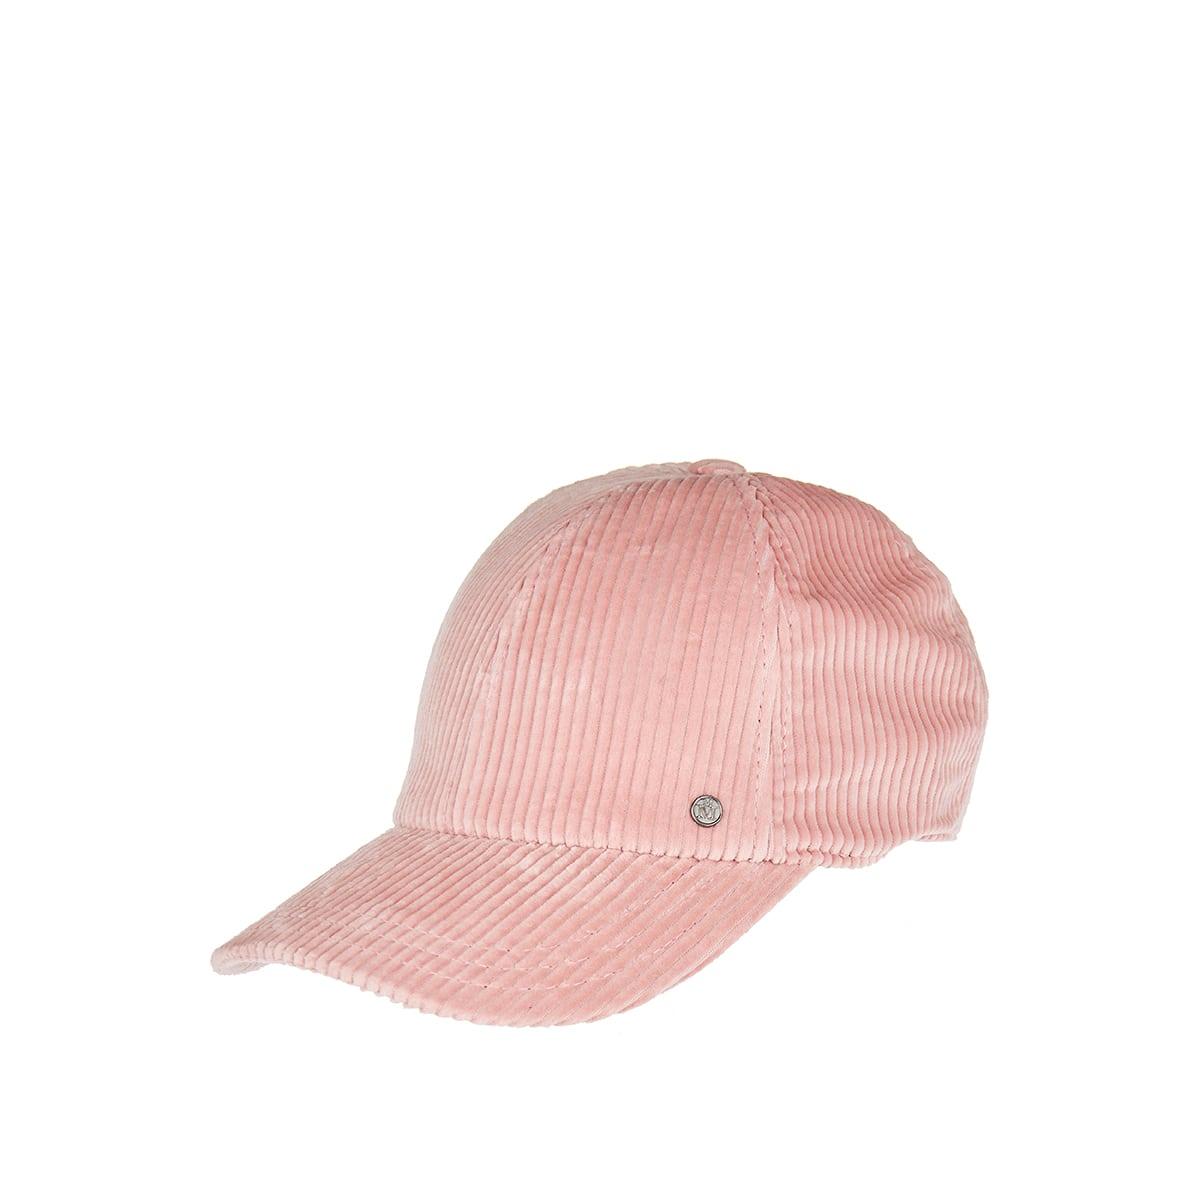 Tiger corduroy baseball cap